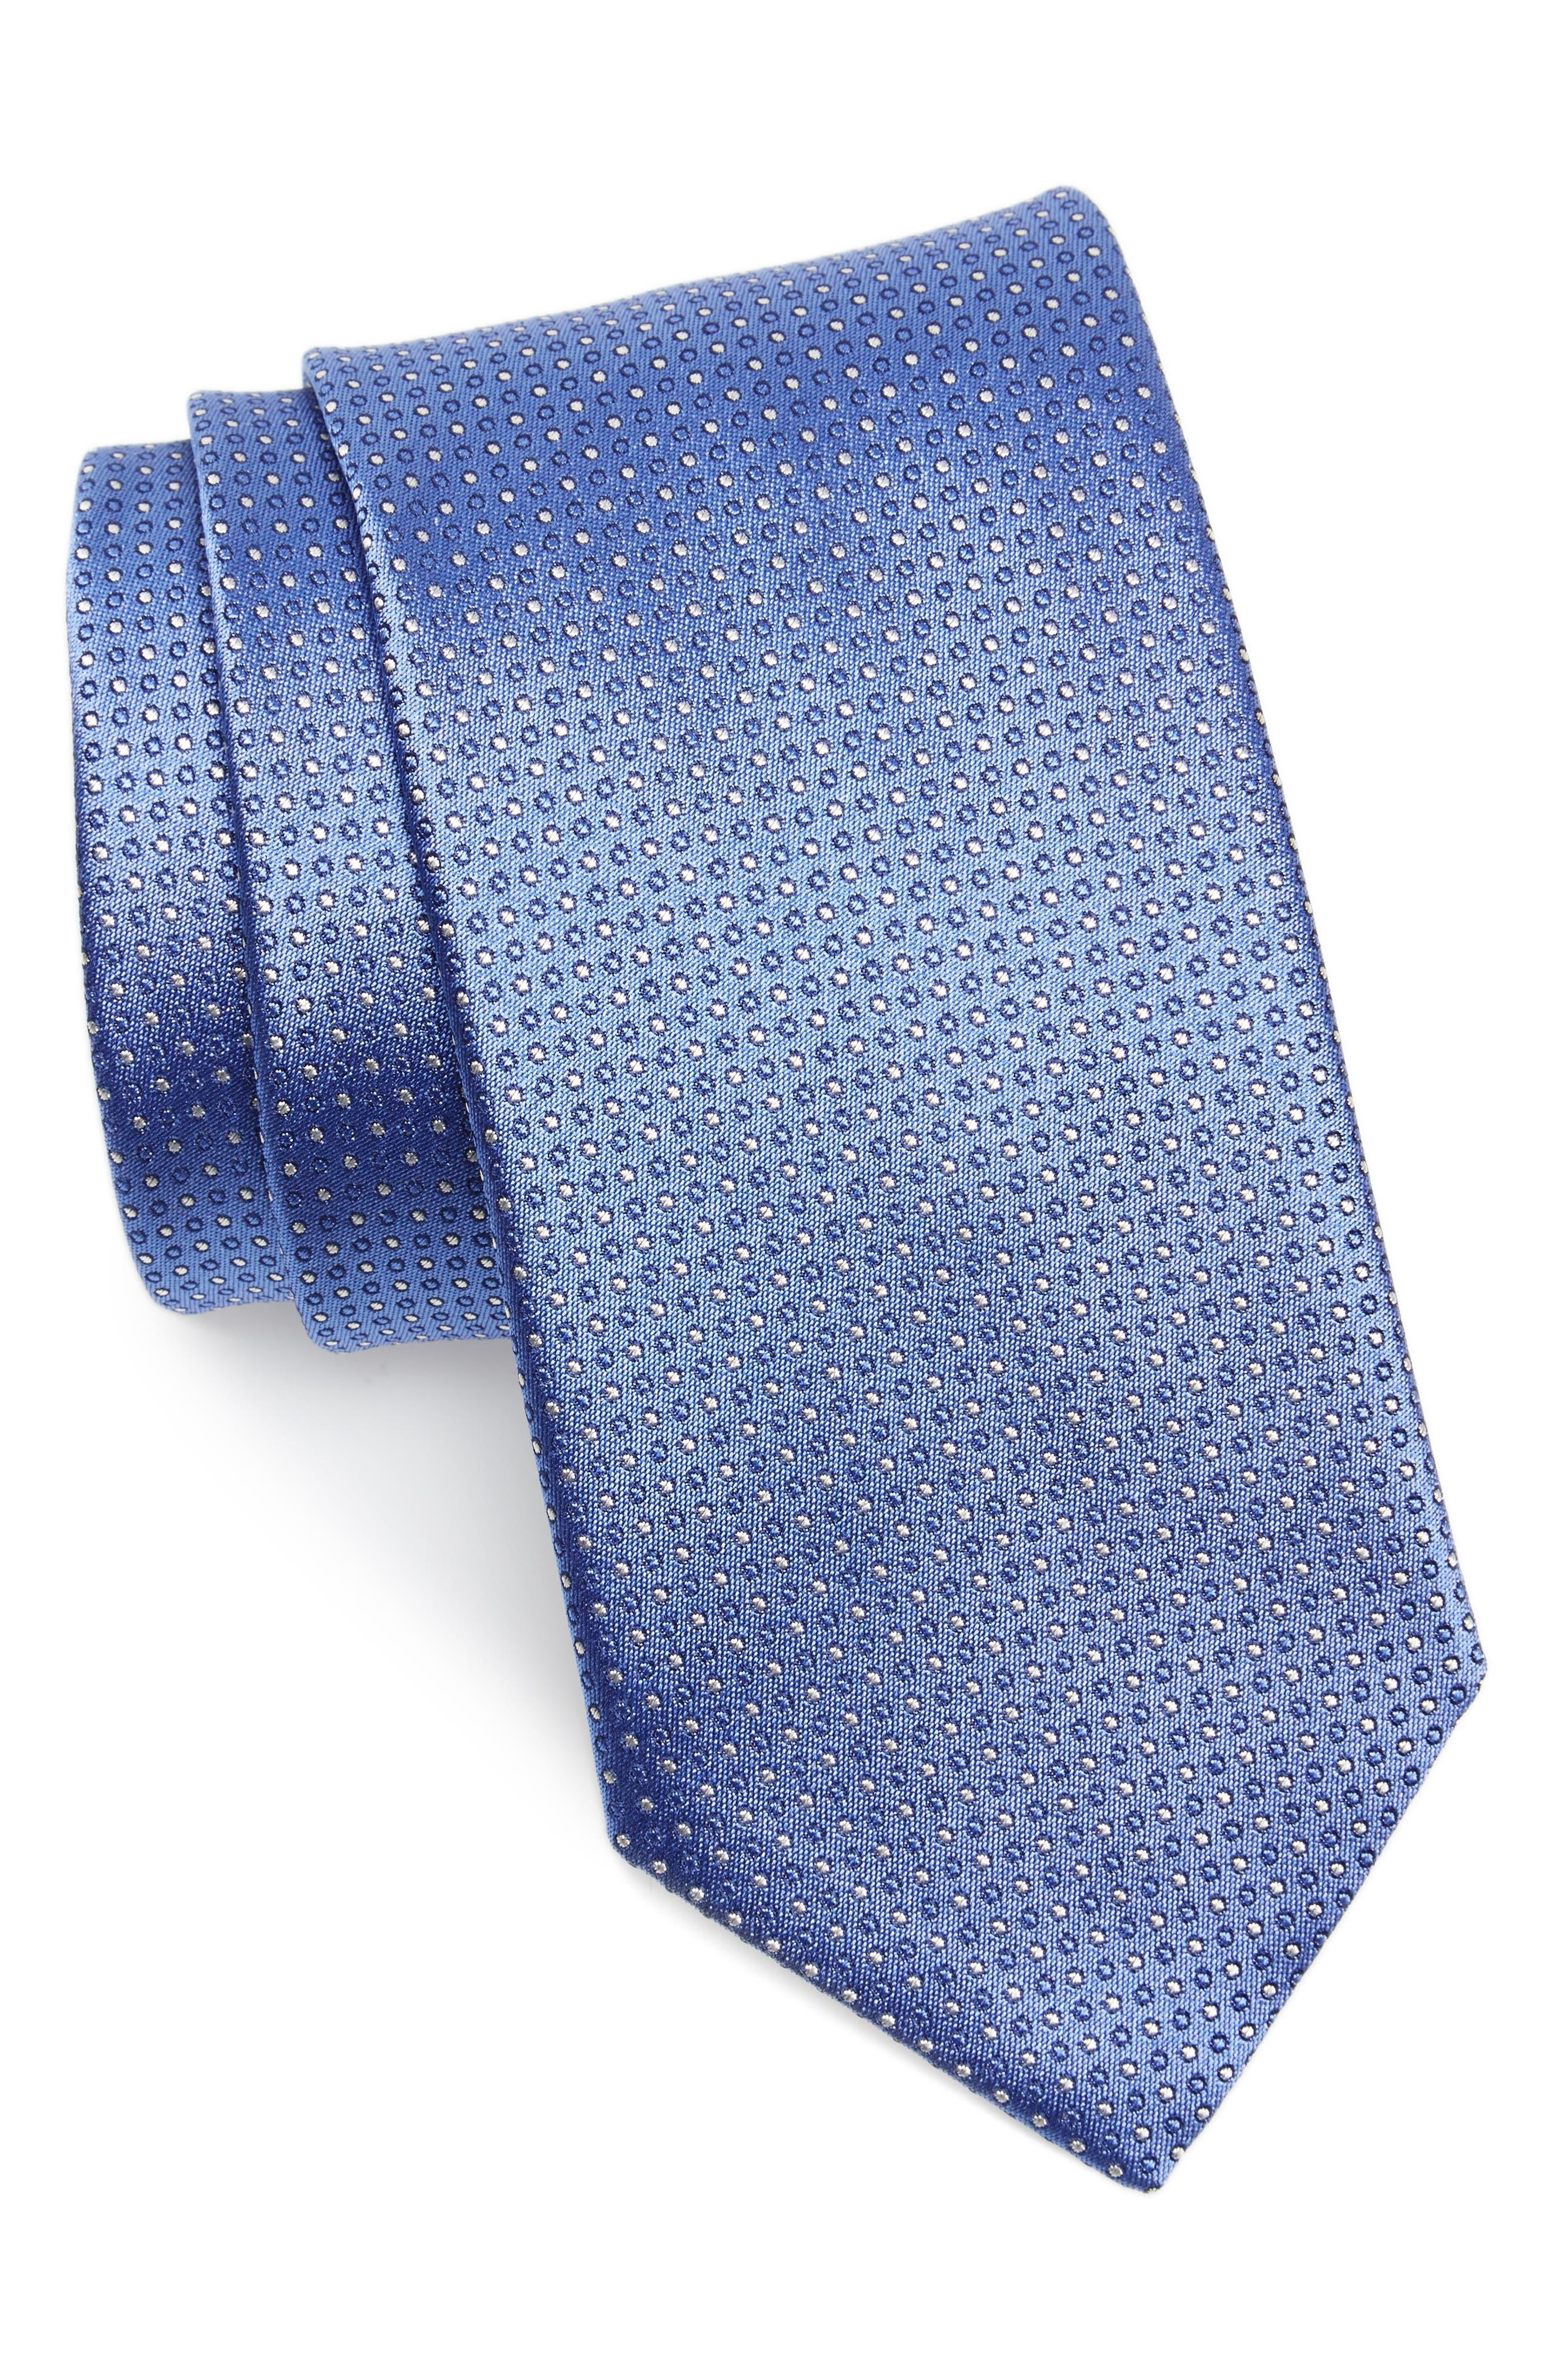 Dot Silk Tie,                         Main,                         color, Light Blue